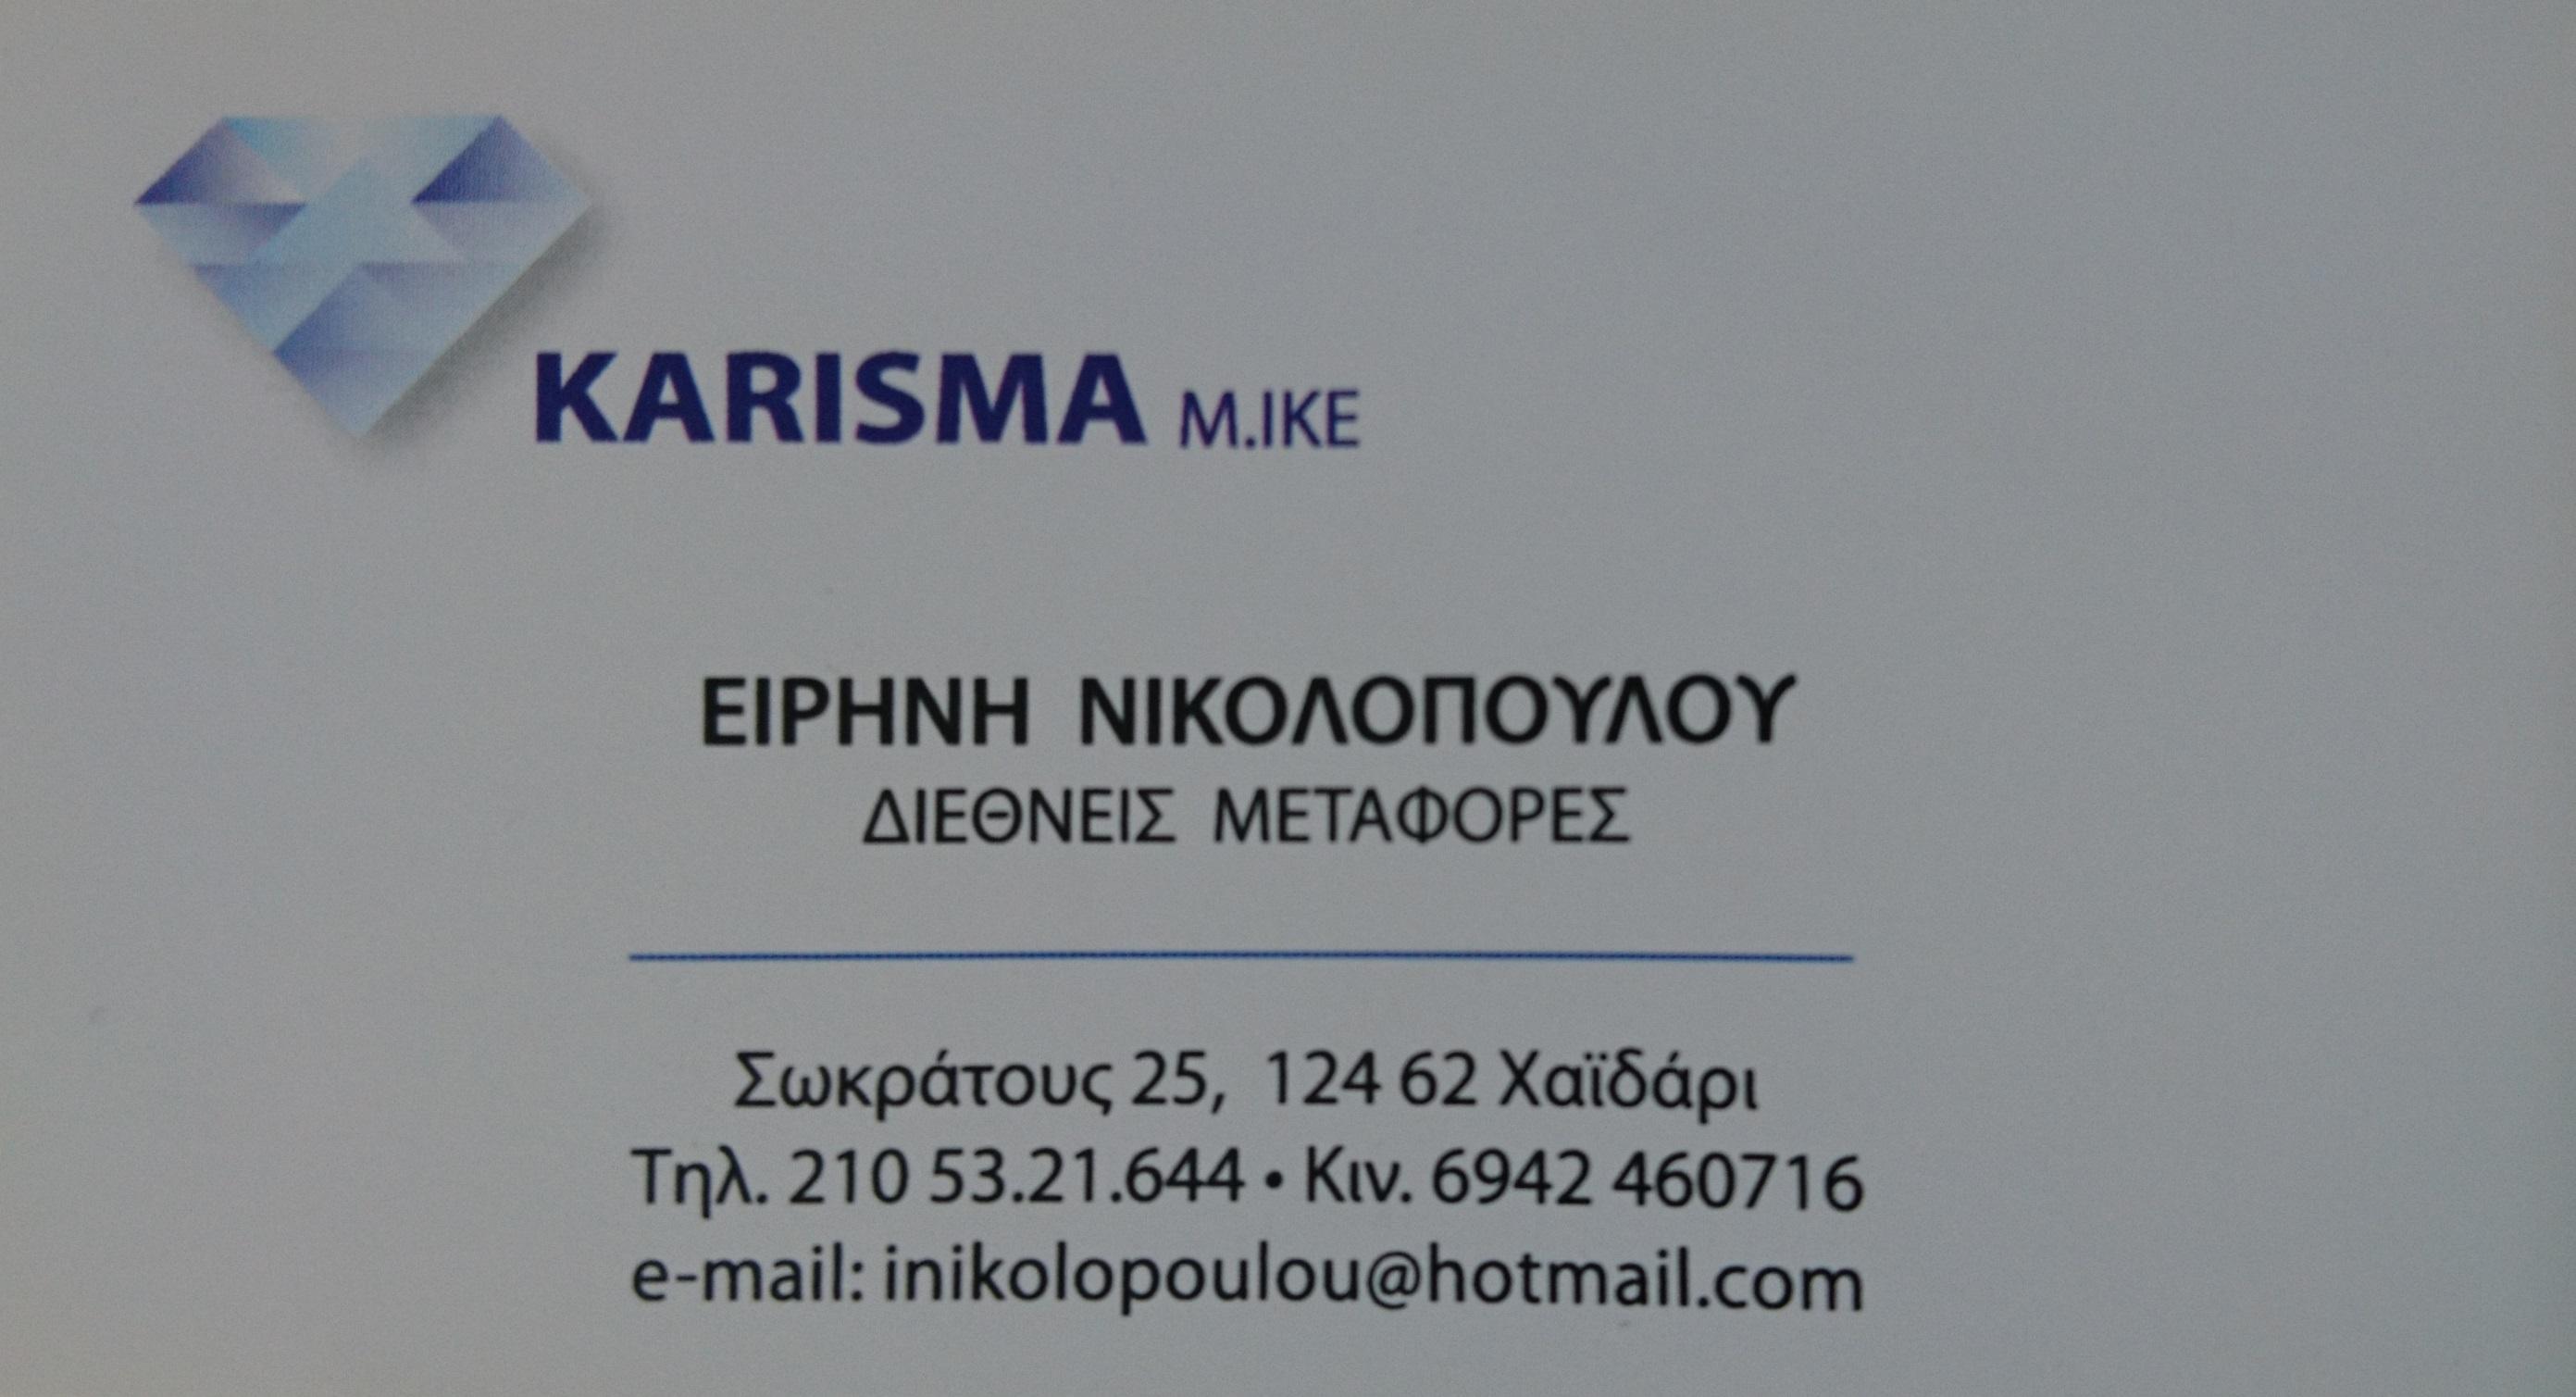 KARISMA M.IKE